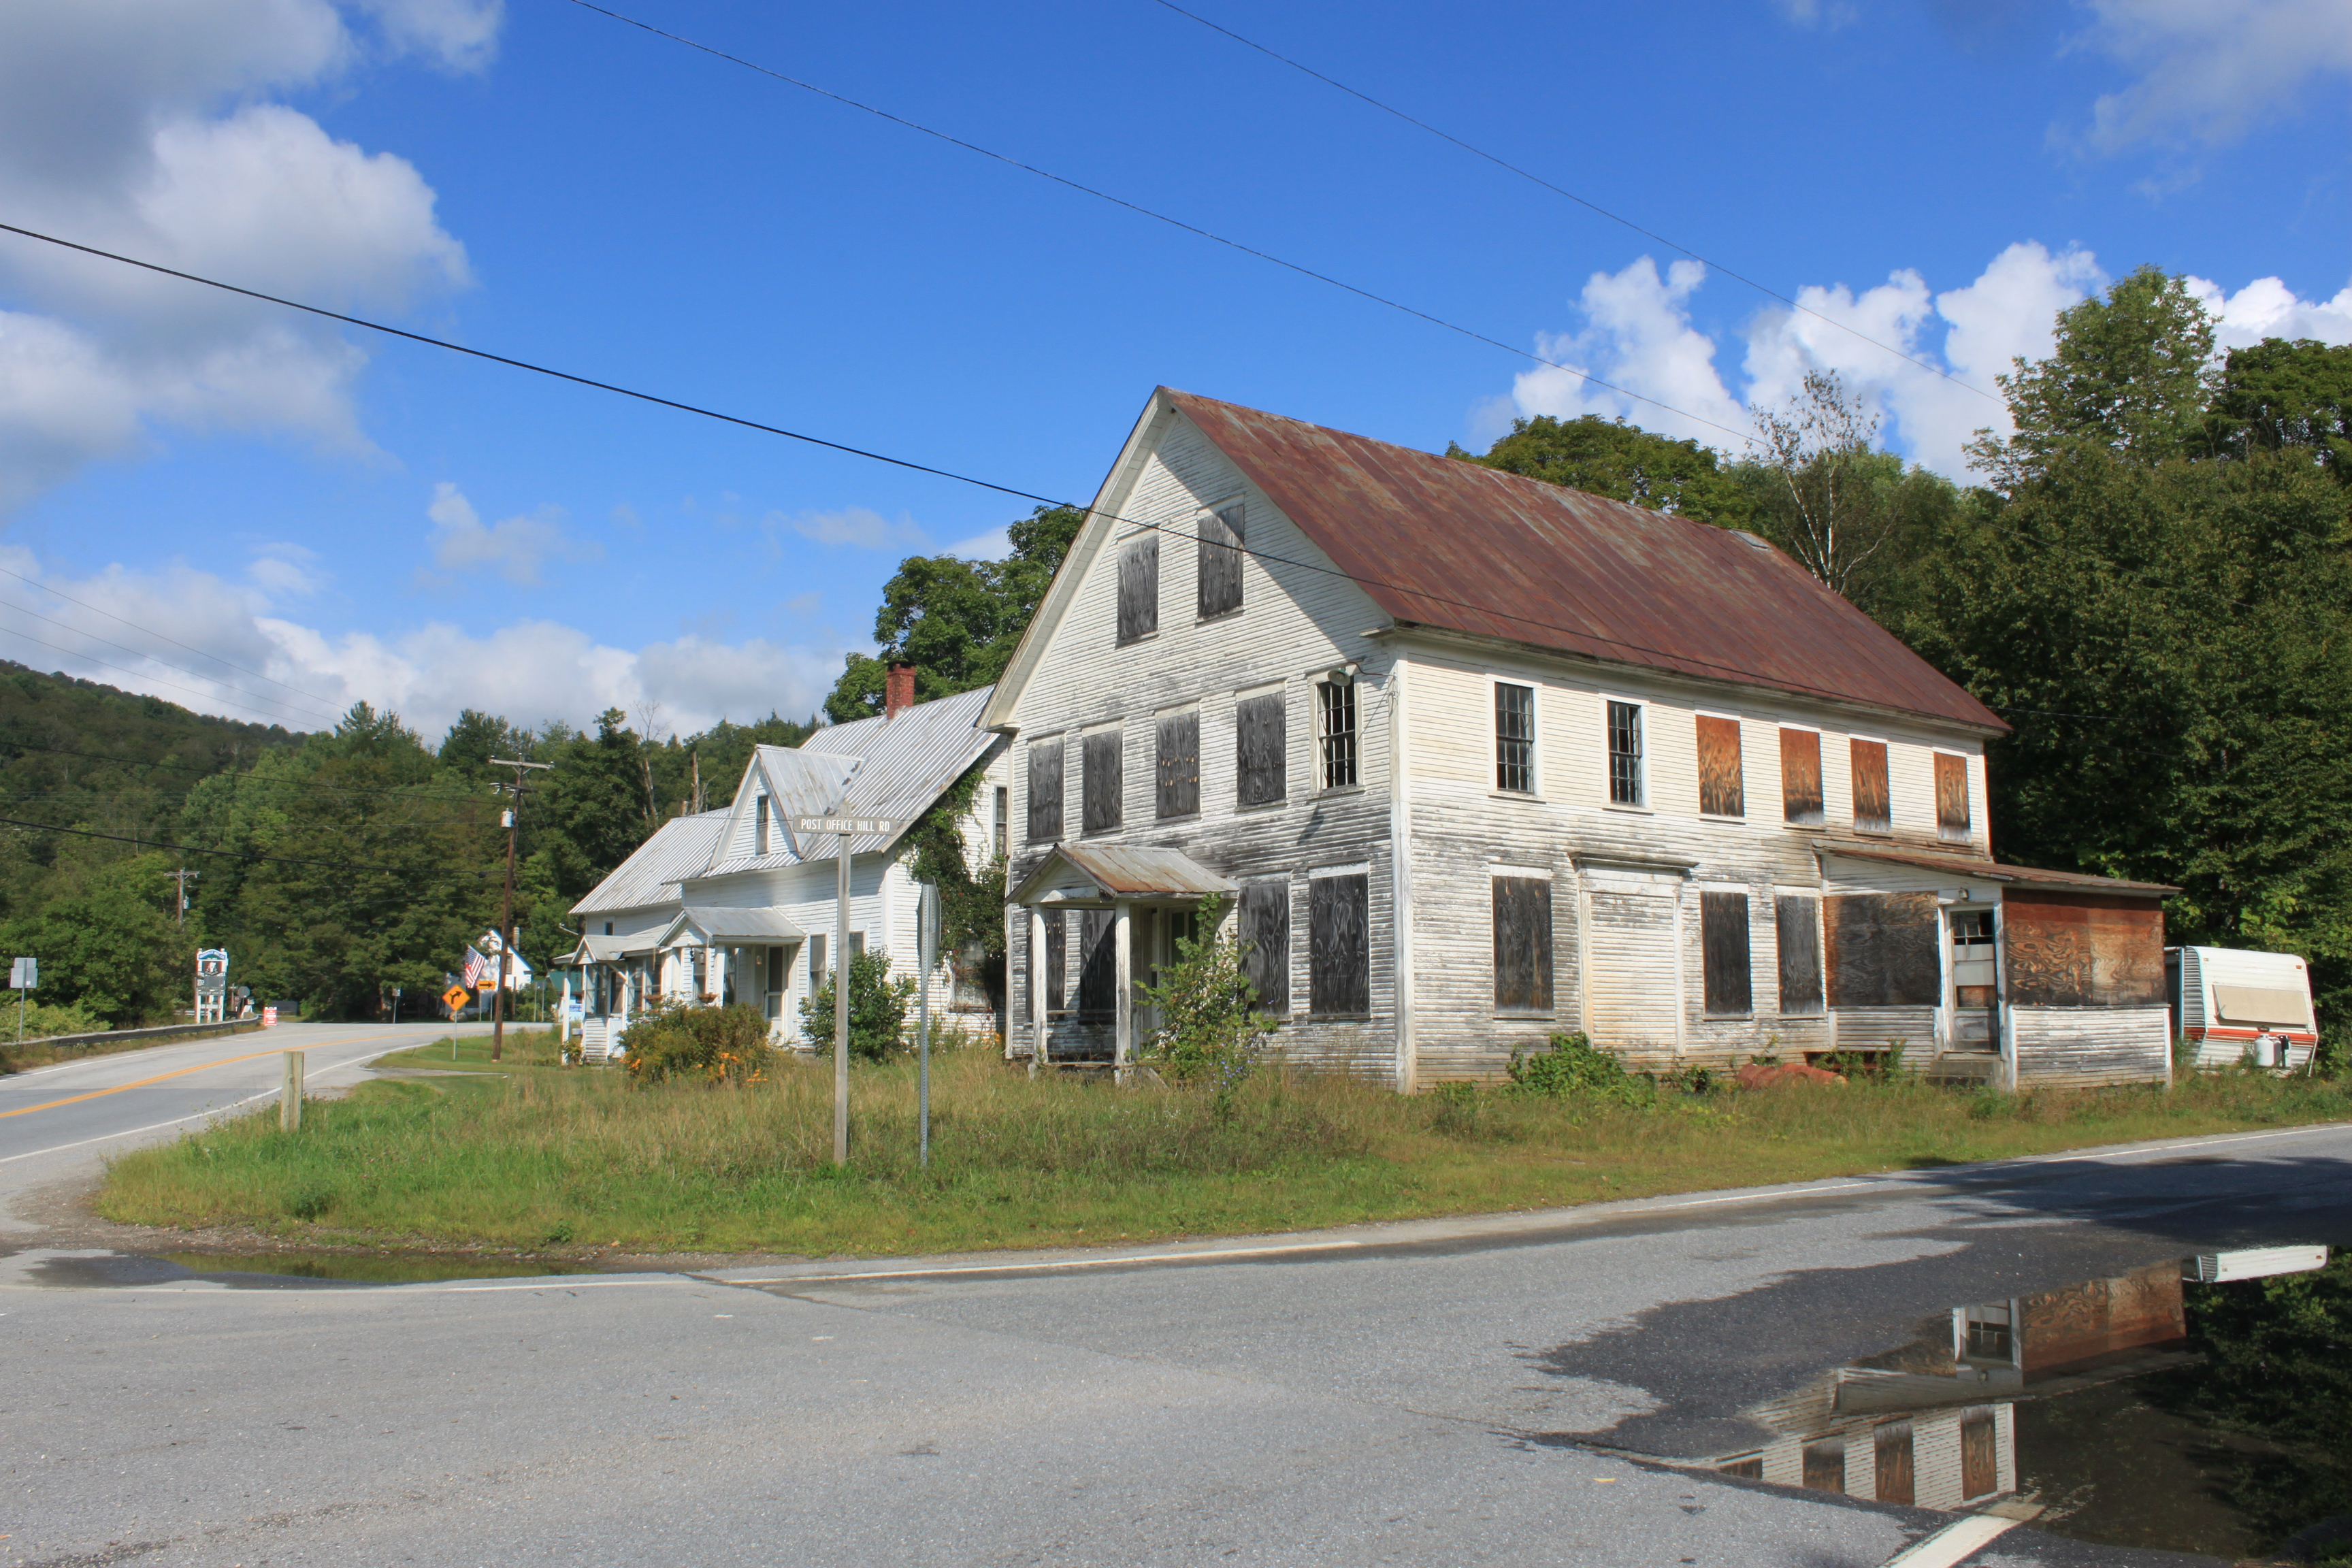 Abandoned vermont granville inn preservation in pink for Granville home of hope